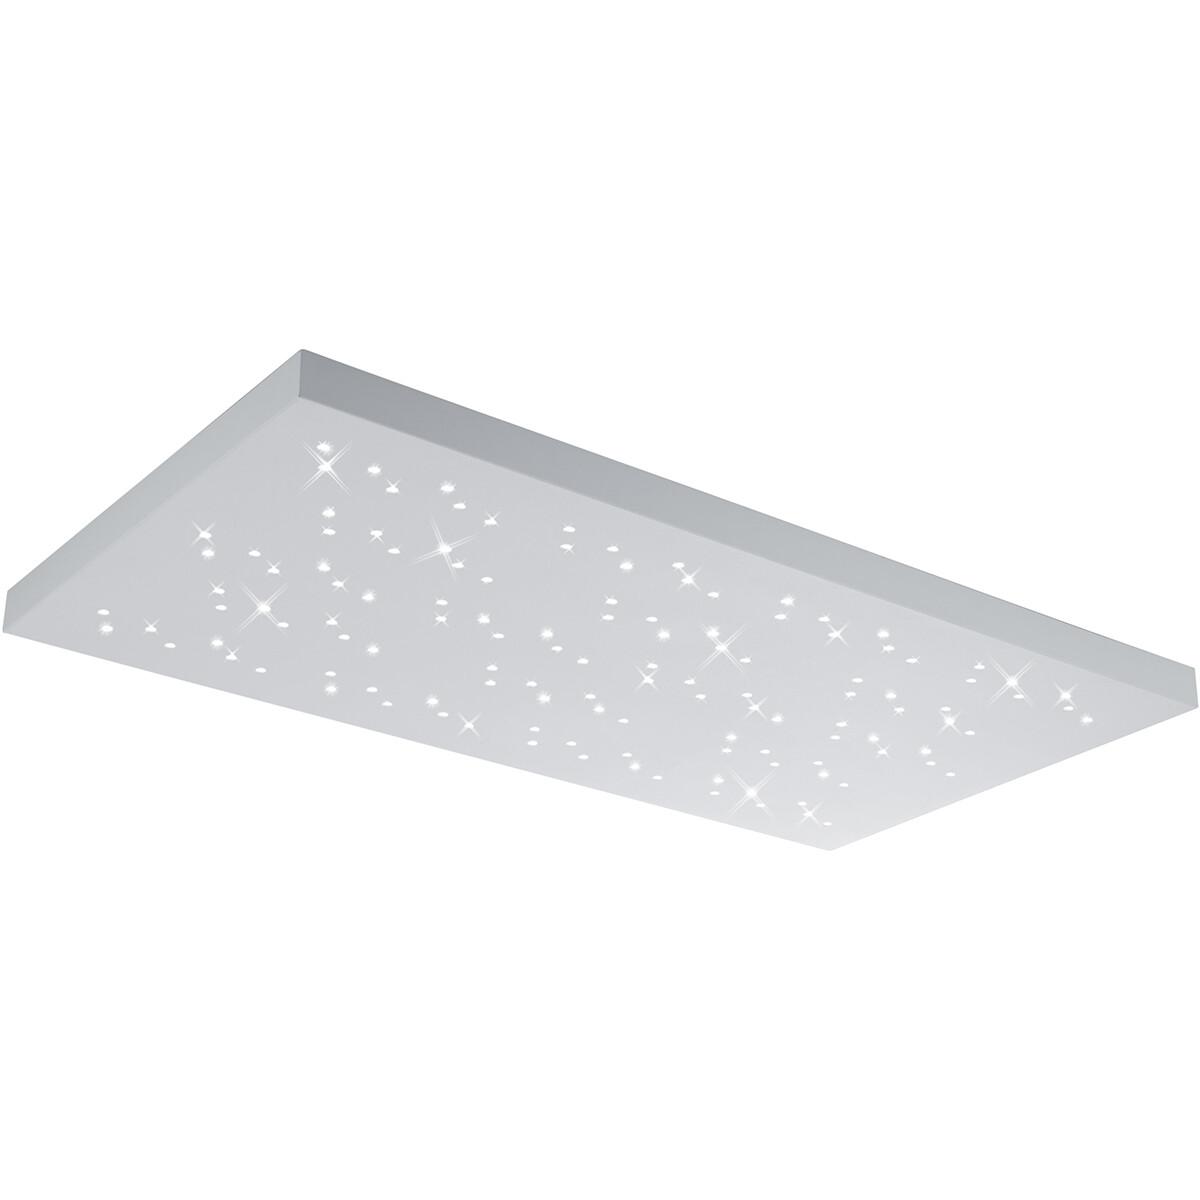 LED Plafondlamp - Plafondverlichting - Trion Tarza - 48W - Aanpasbare Kleur - Rechthoek - Mat Wit -